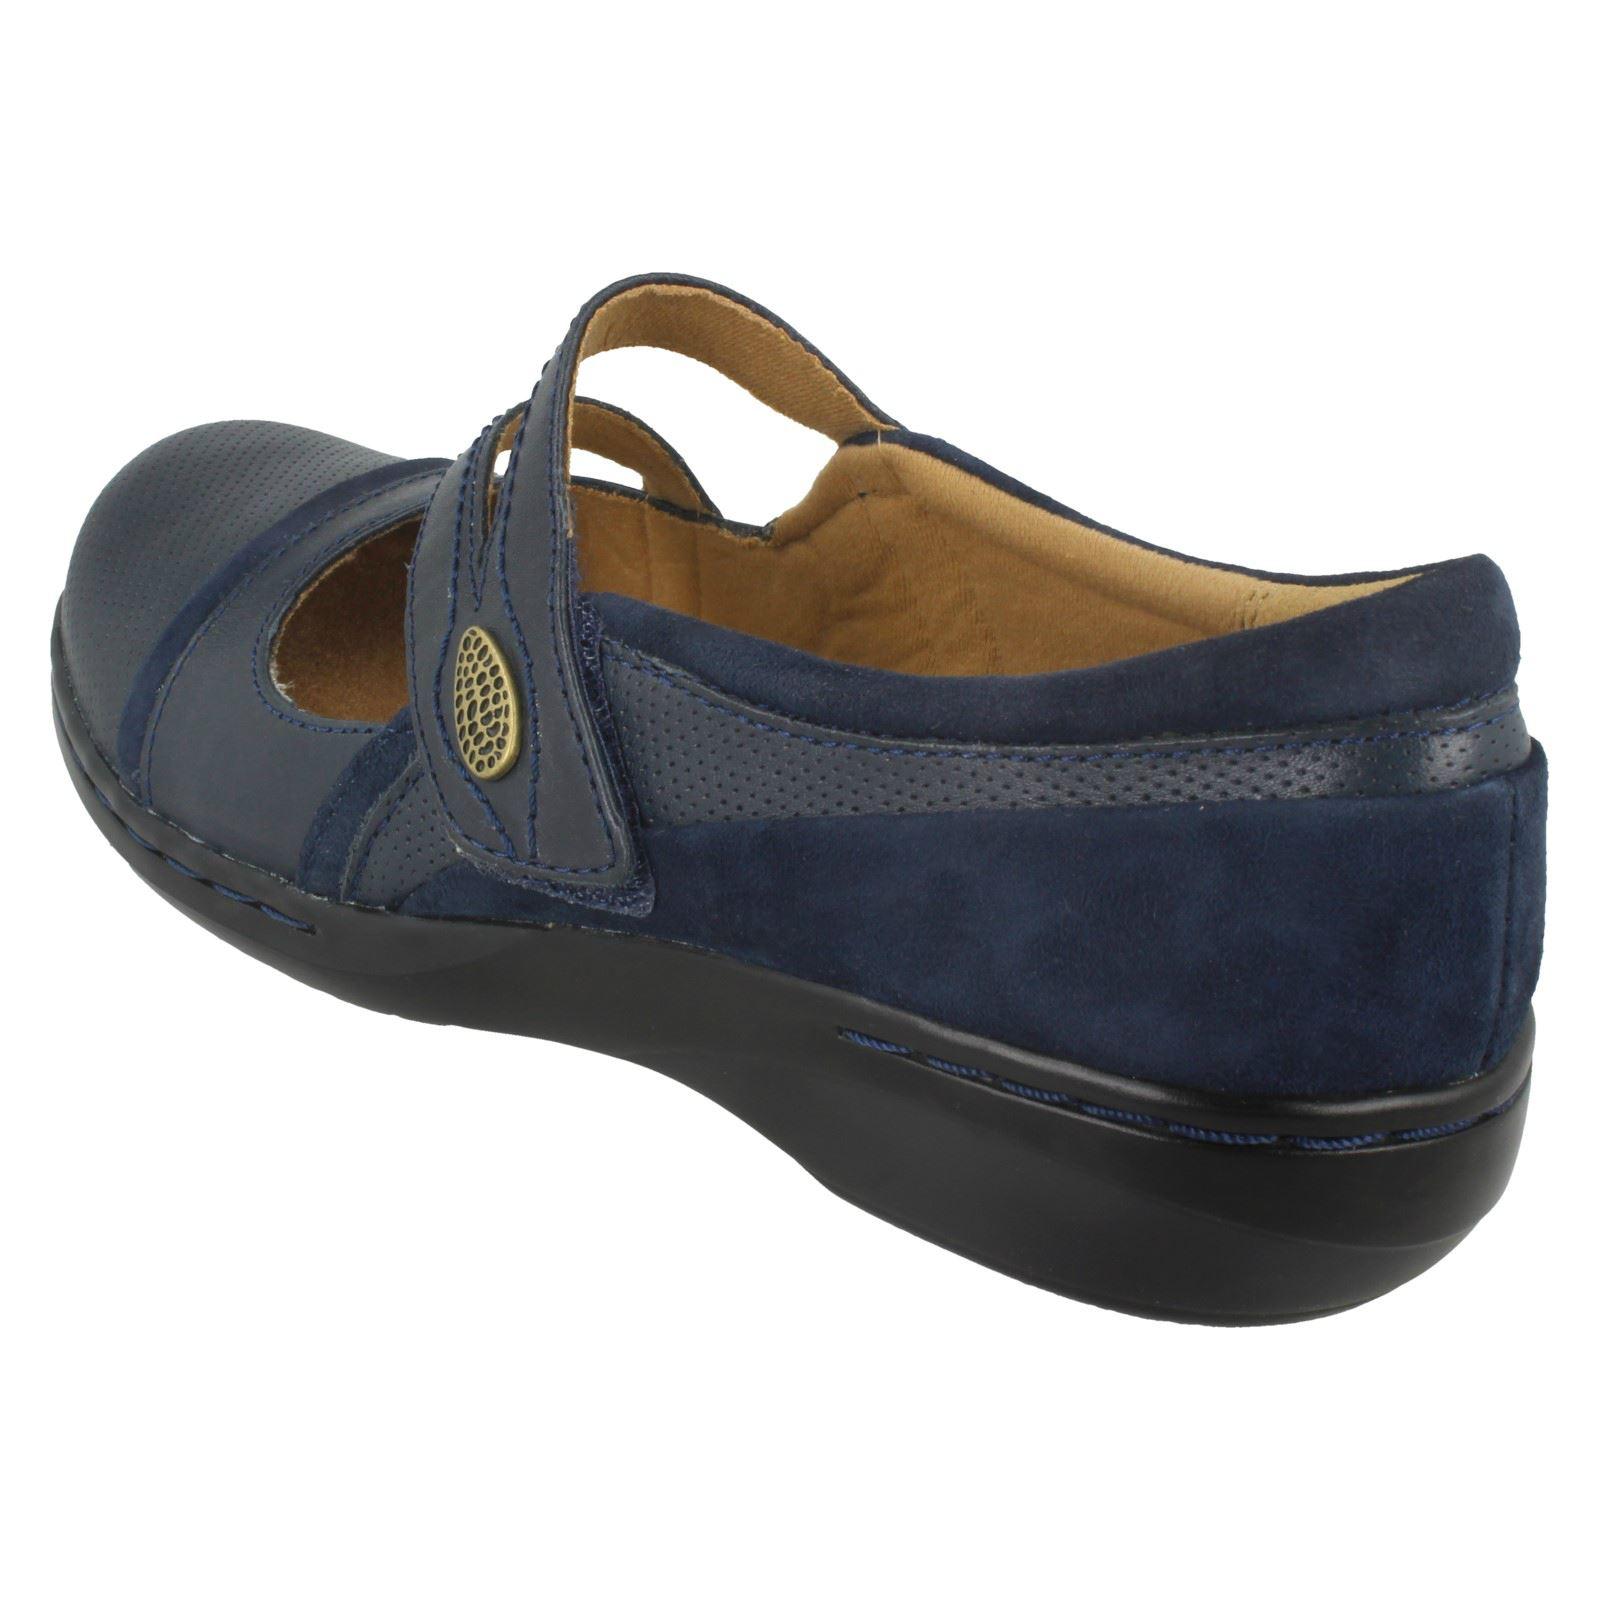 Clarks Pisos Casual azul Crown Navy de Everyday cuero Hook Ladies Loop Evianna pfdWwadq